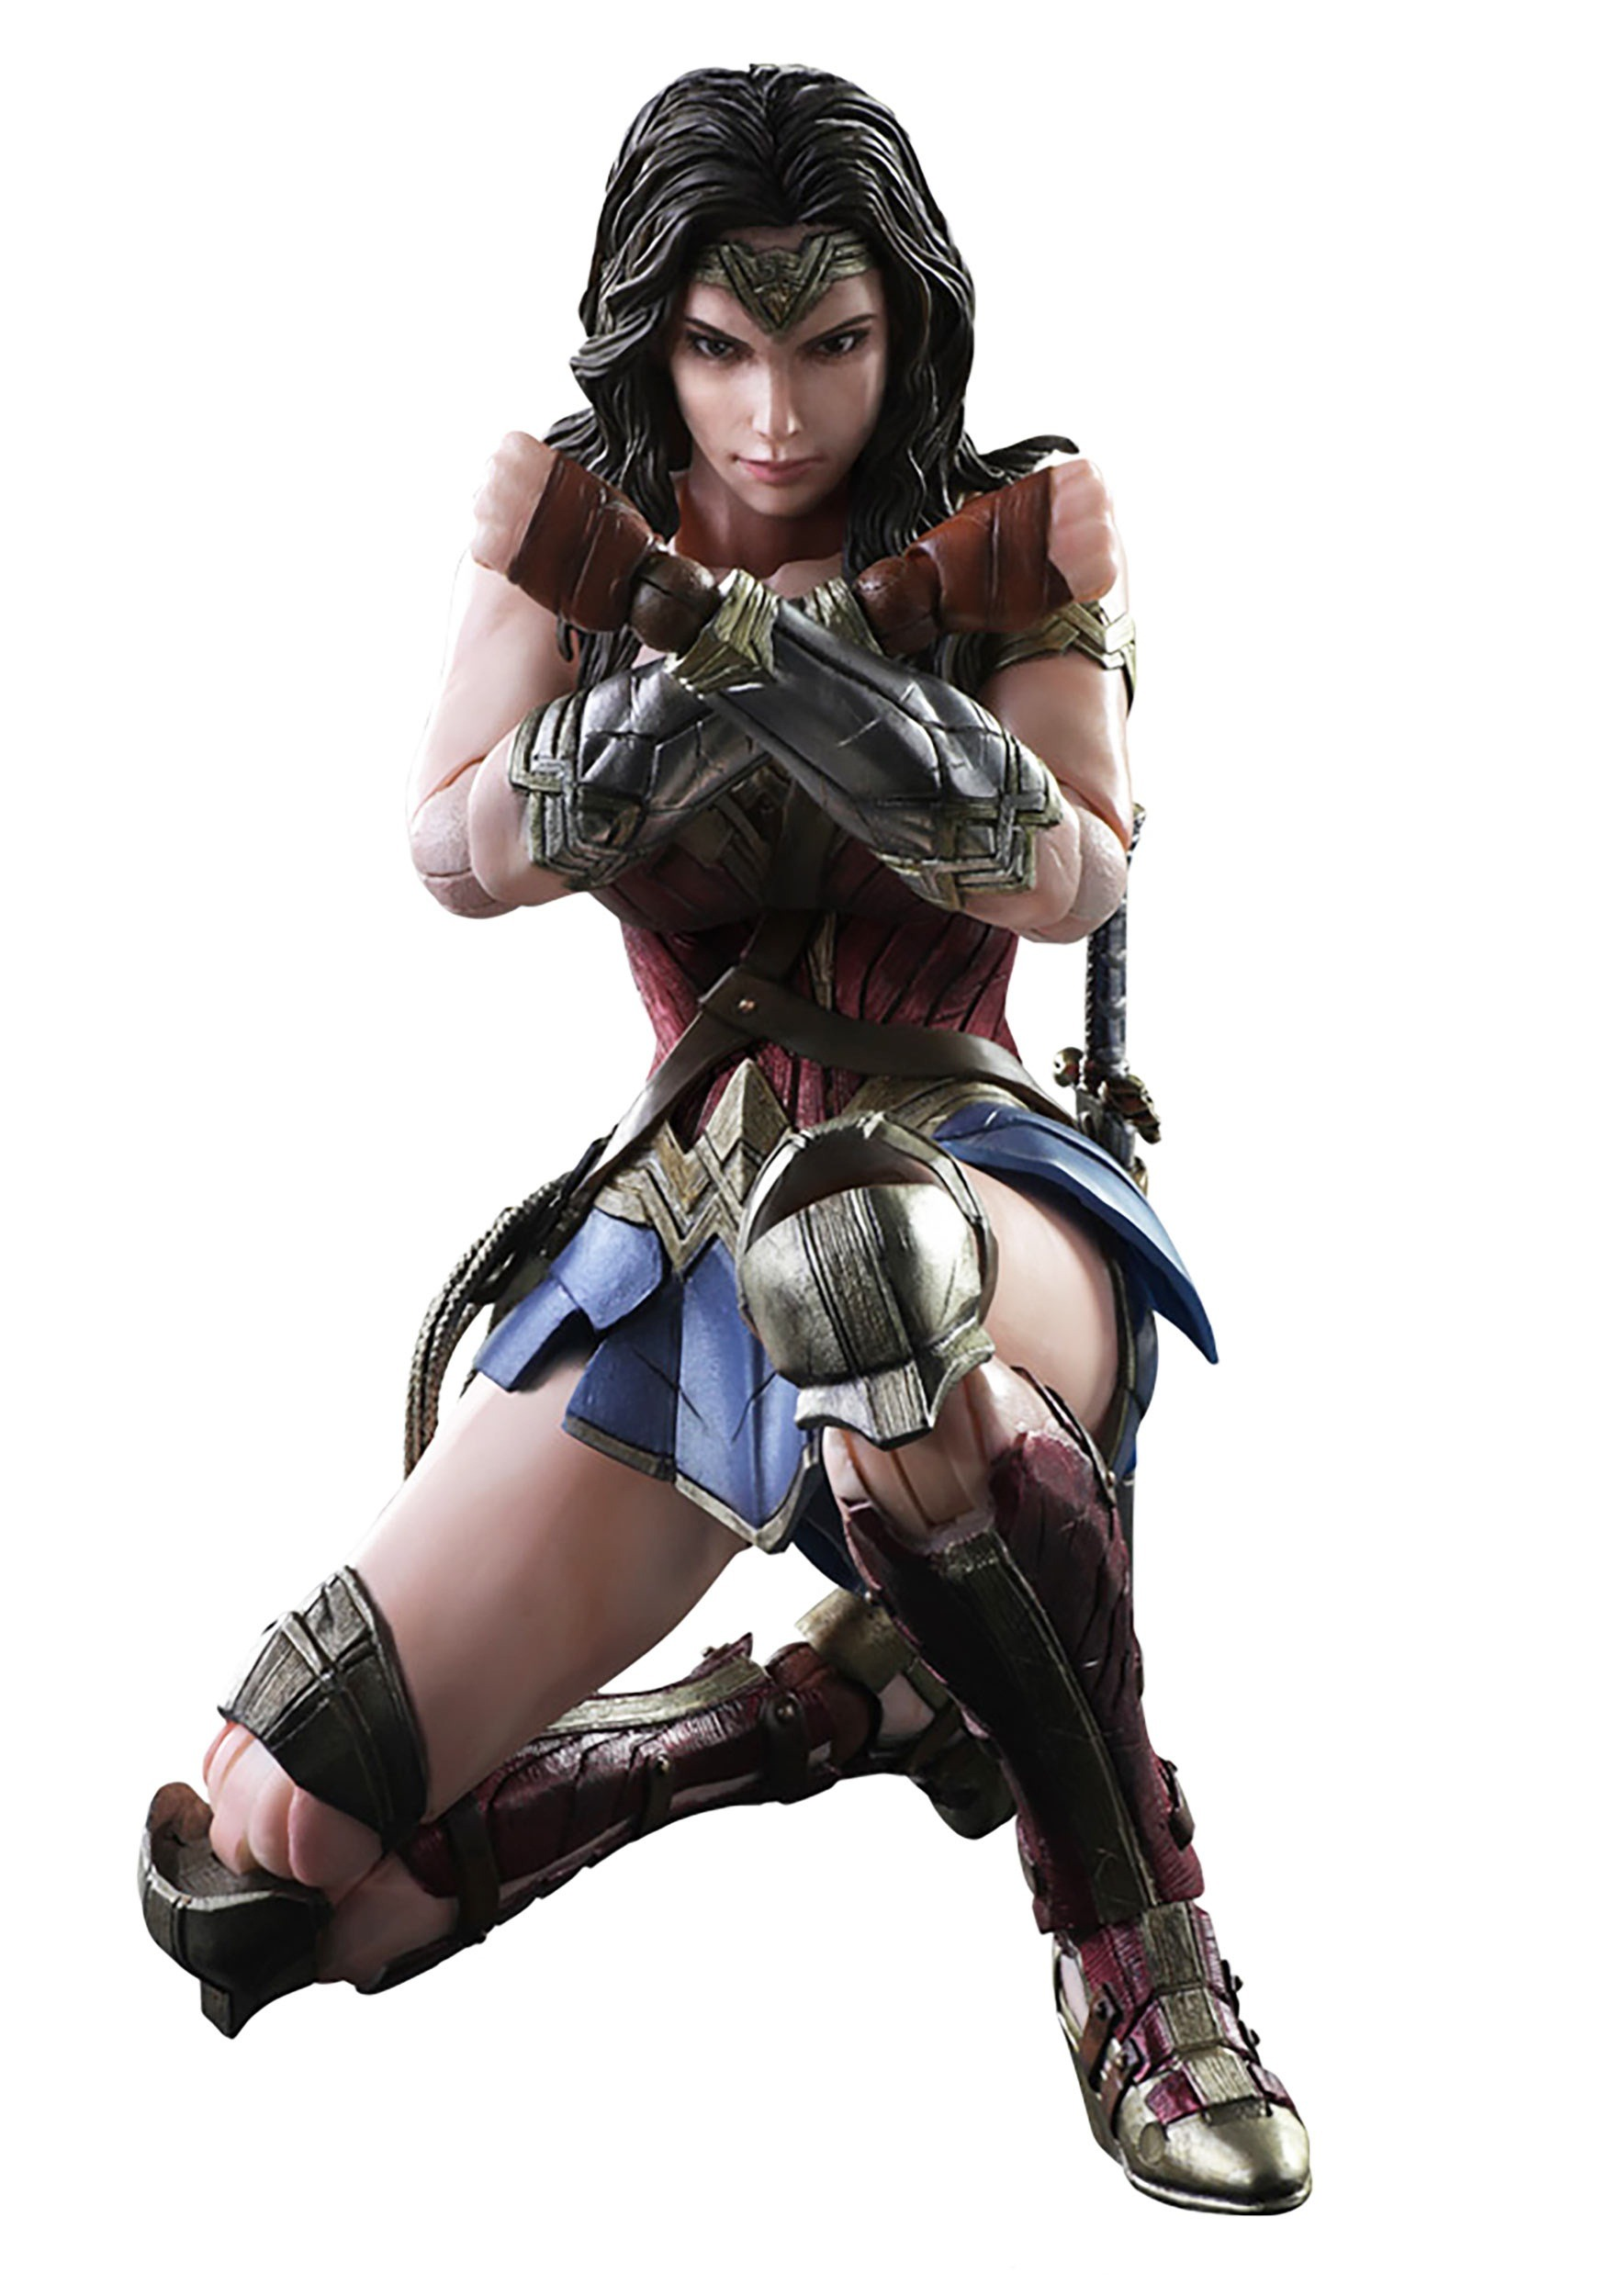 Wonder woman costume images-2284